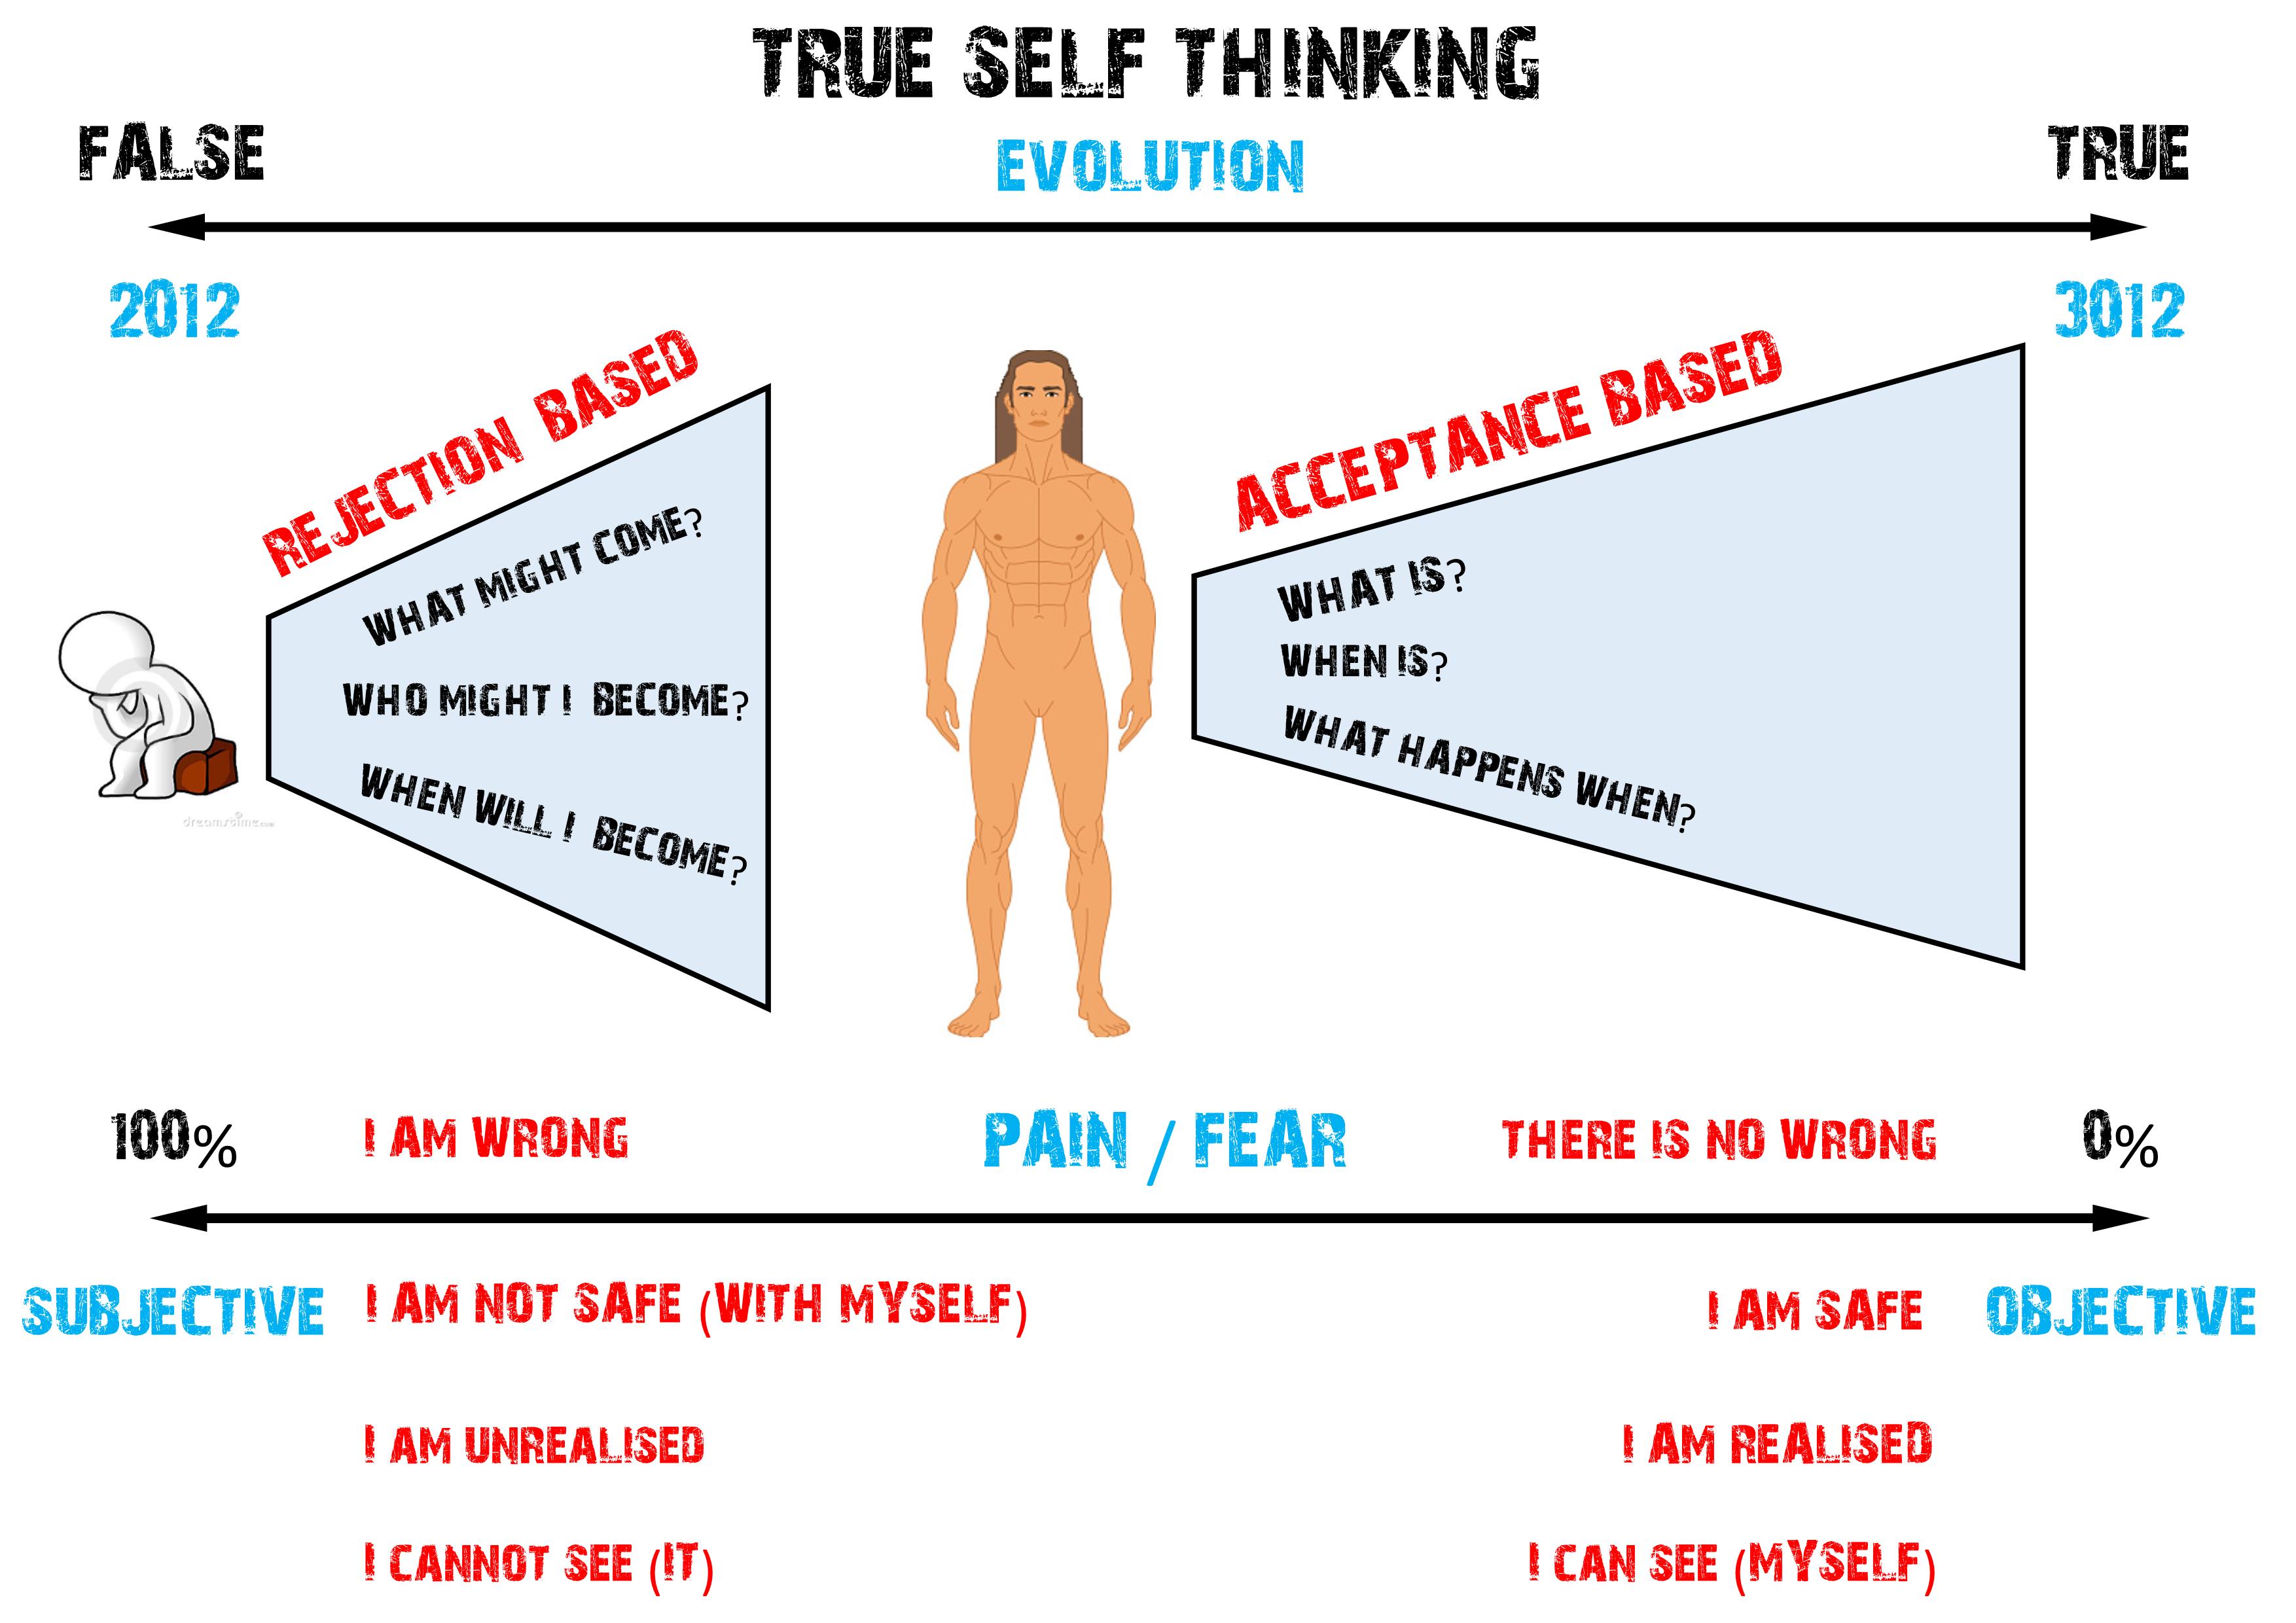 True Self Thinking